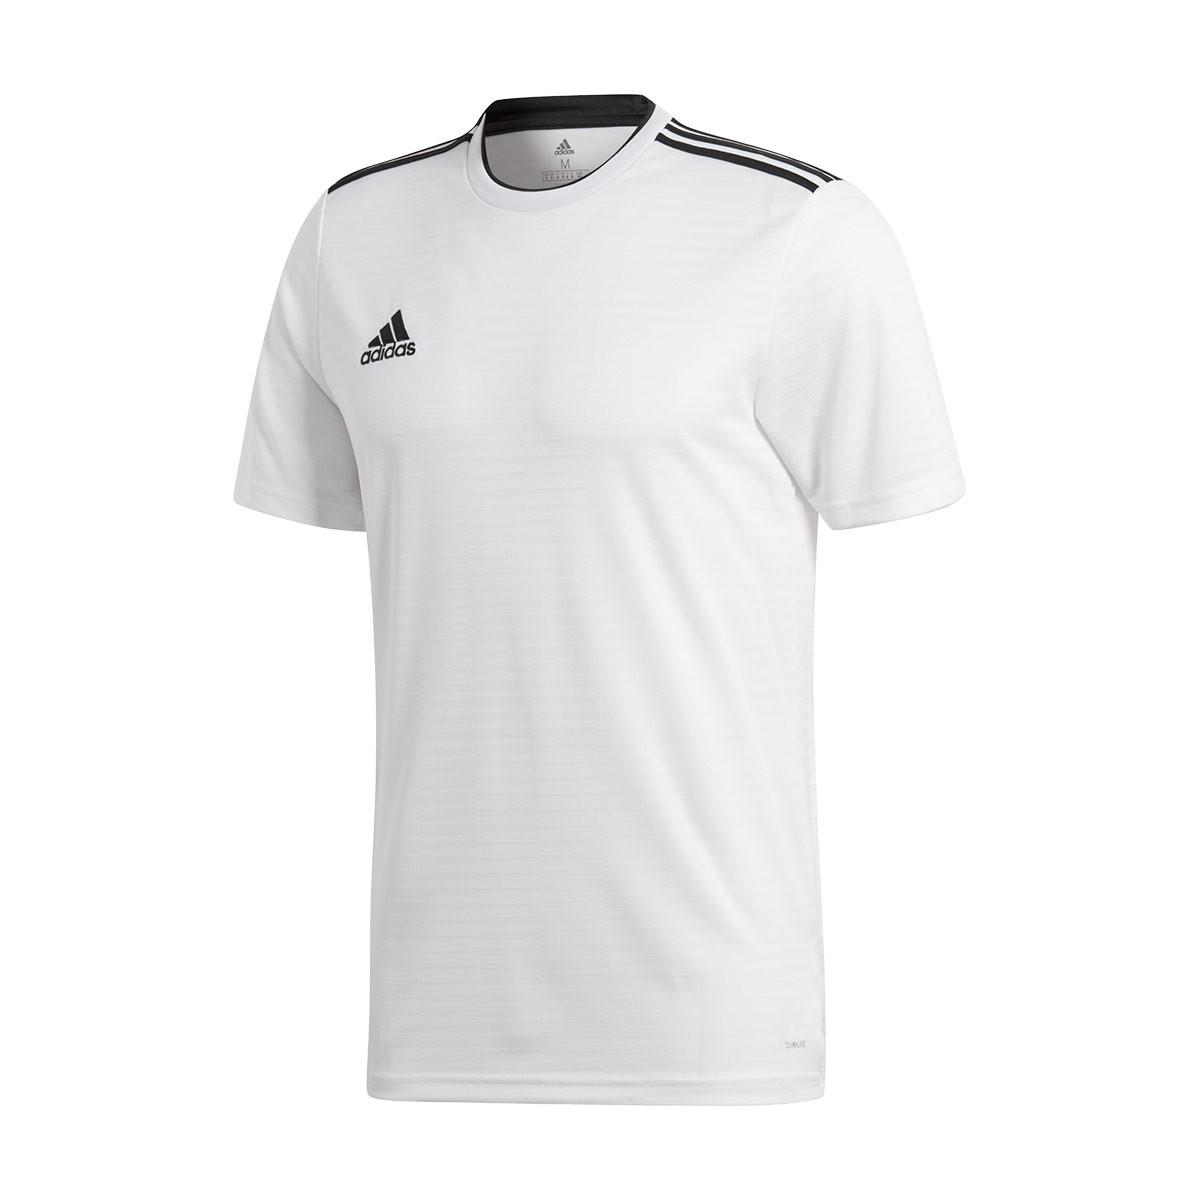 Maglia Adidas Condivo Bianco 18 M / C Bianco Condivo Nero Soloporteros Es Ahora 10be50